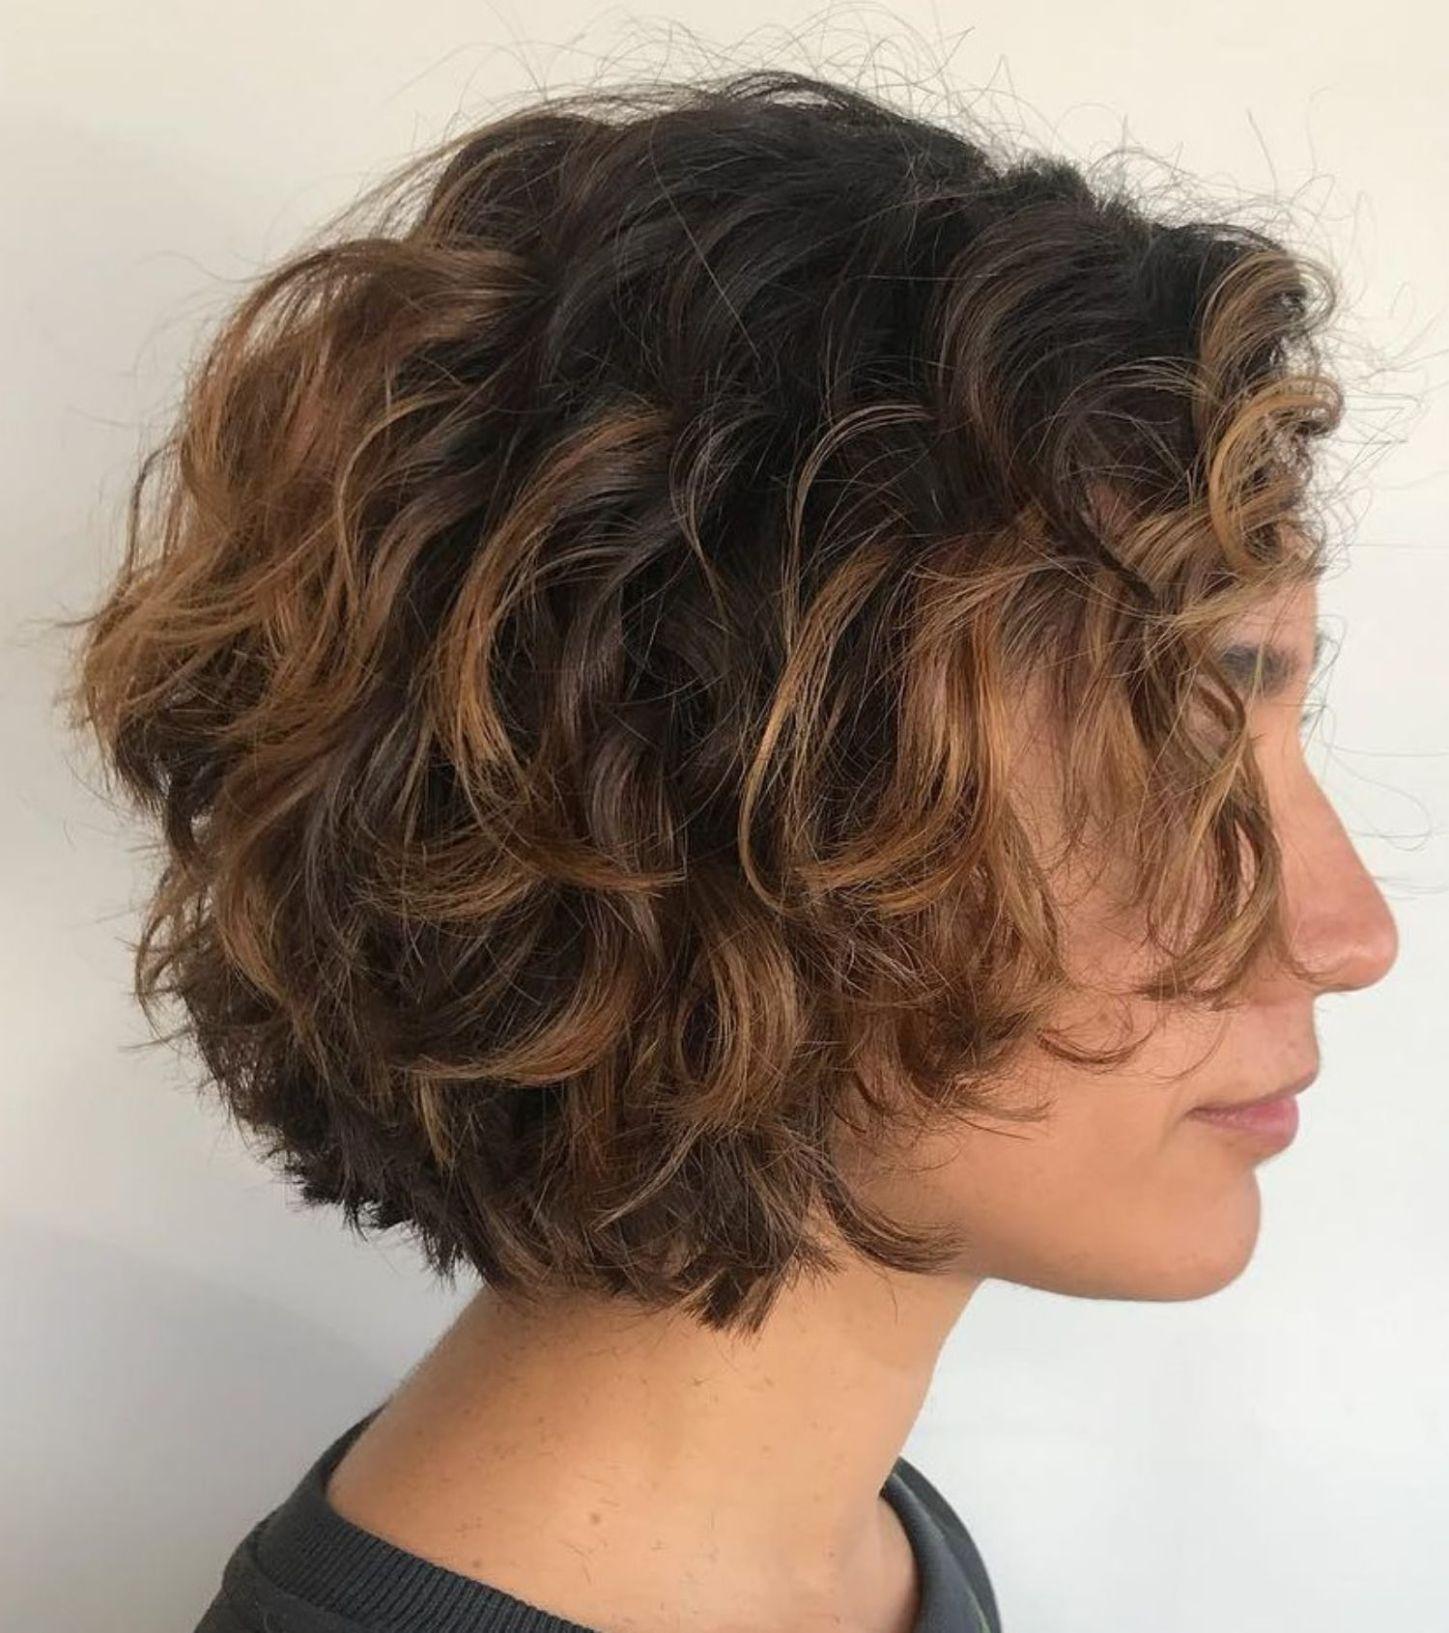 60 Most Delightful Short Wavy Hairstyles Short Wavy Hair Short Layered Curly Hair Hair Styles